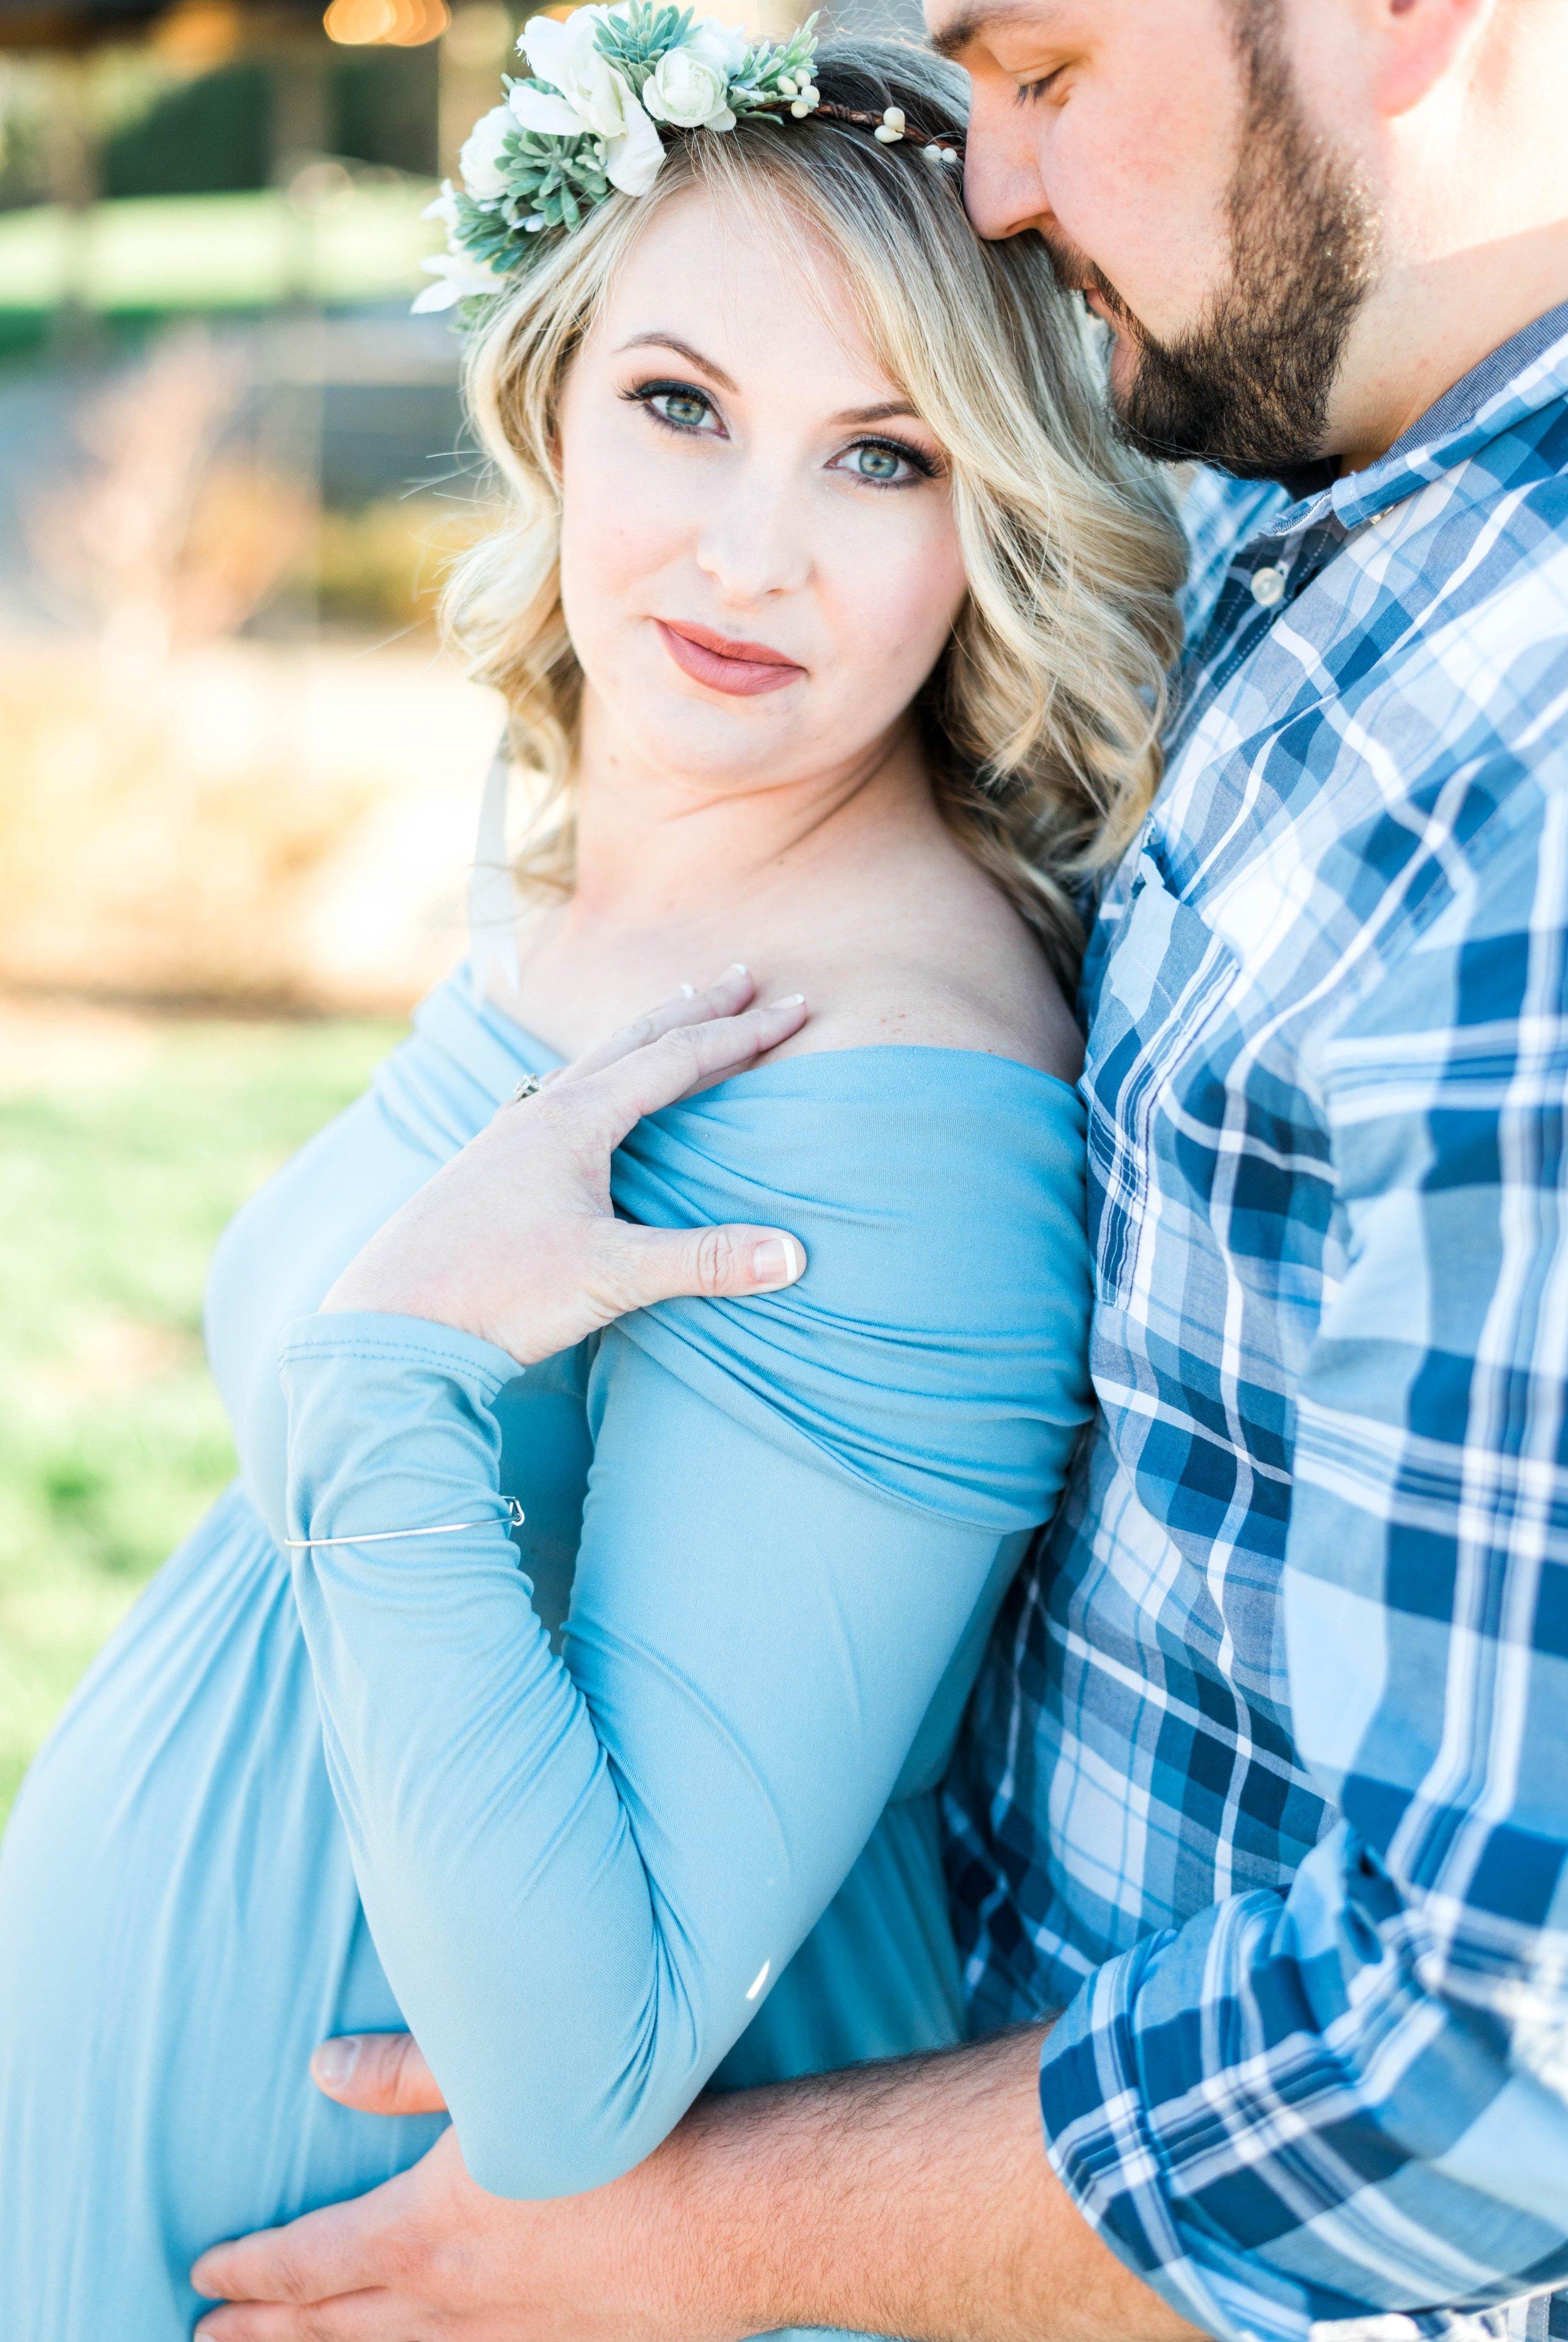 SorellaFarms_Jessica+Dylan_MaternitySession_Virginiaweddingphotographer 21.jpg